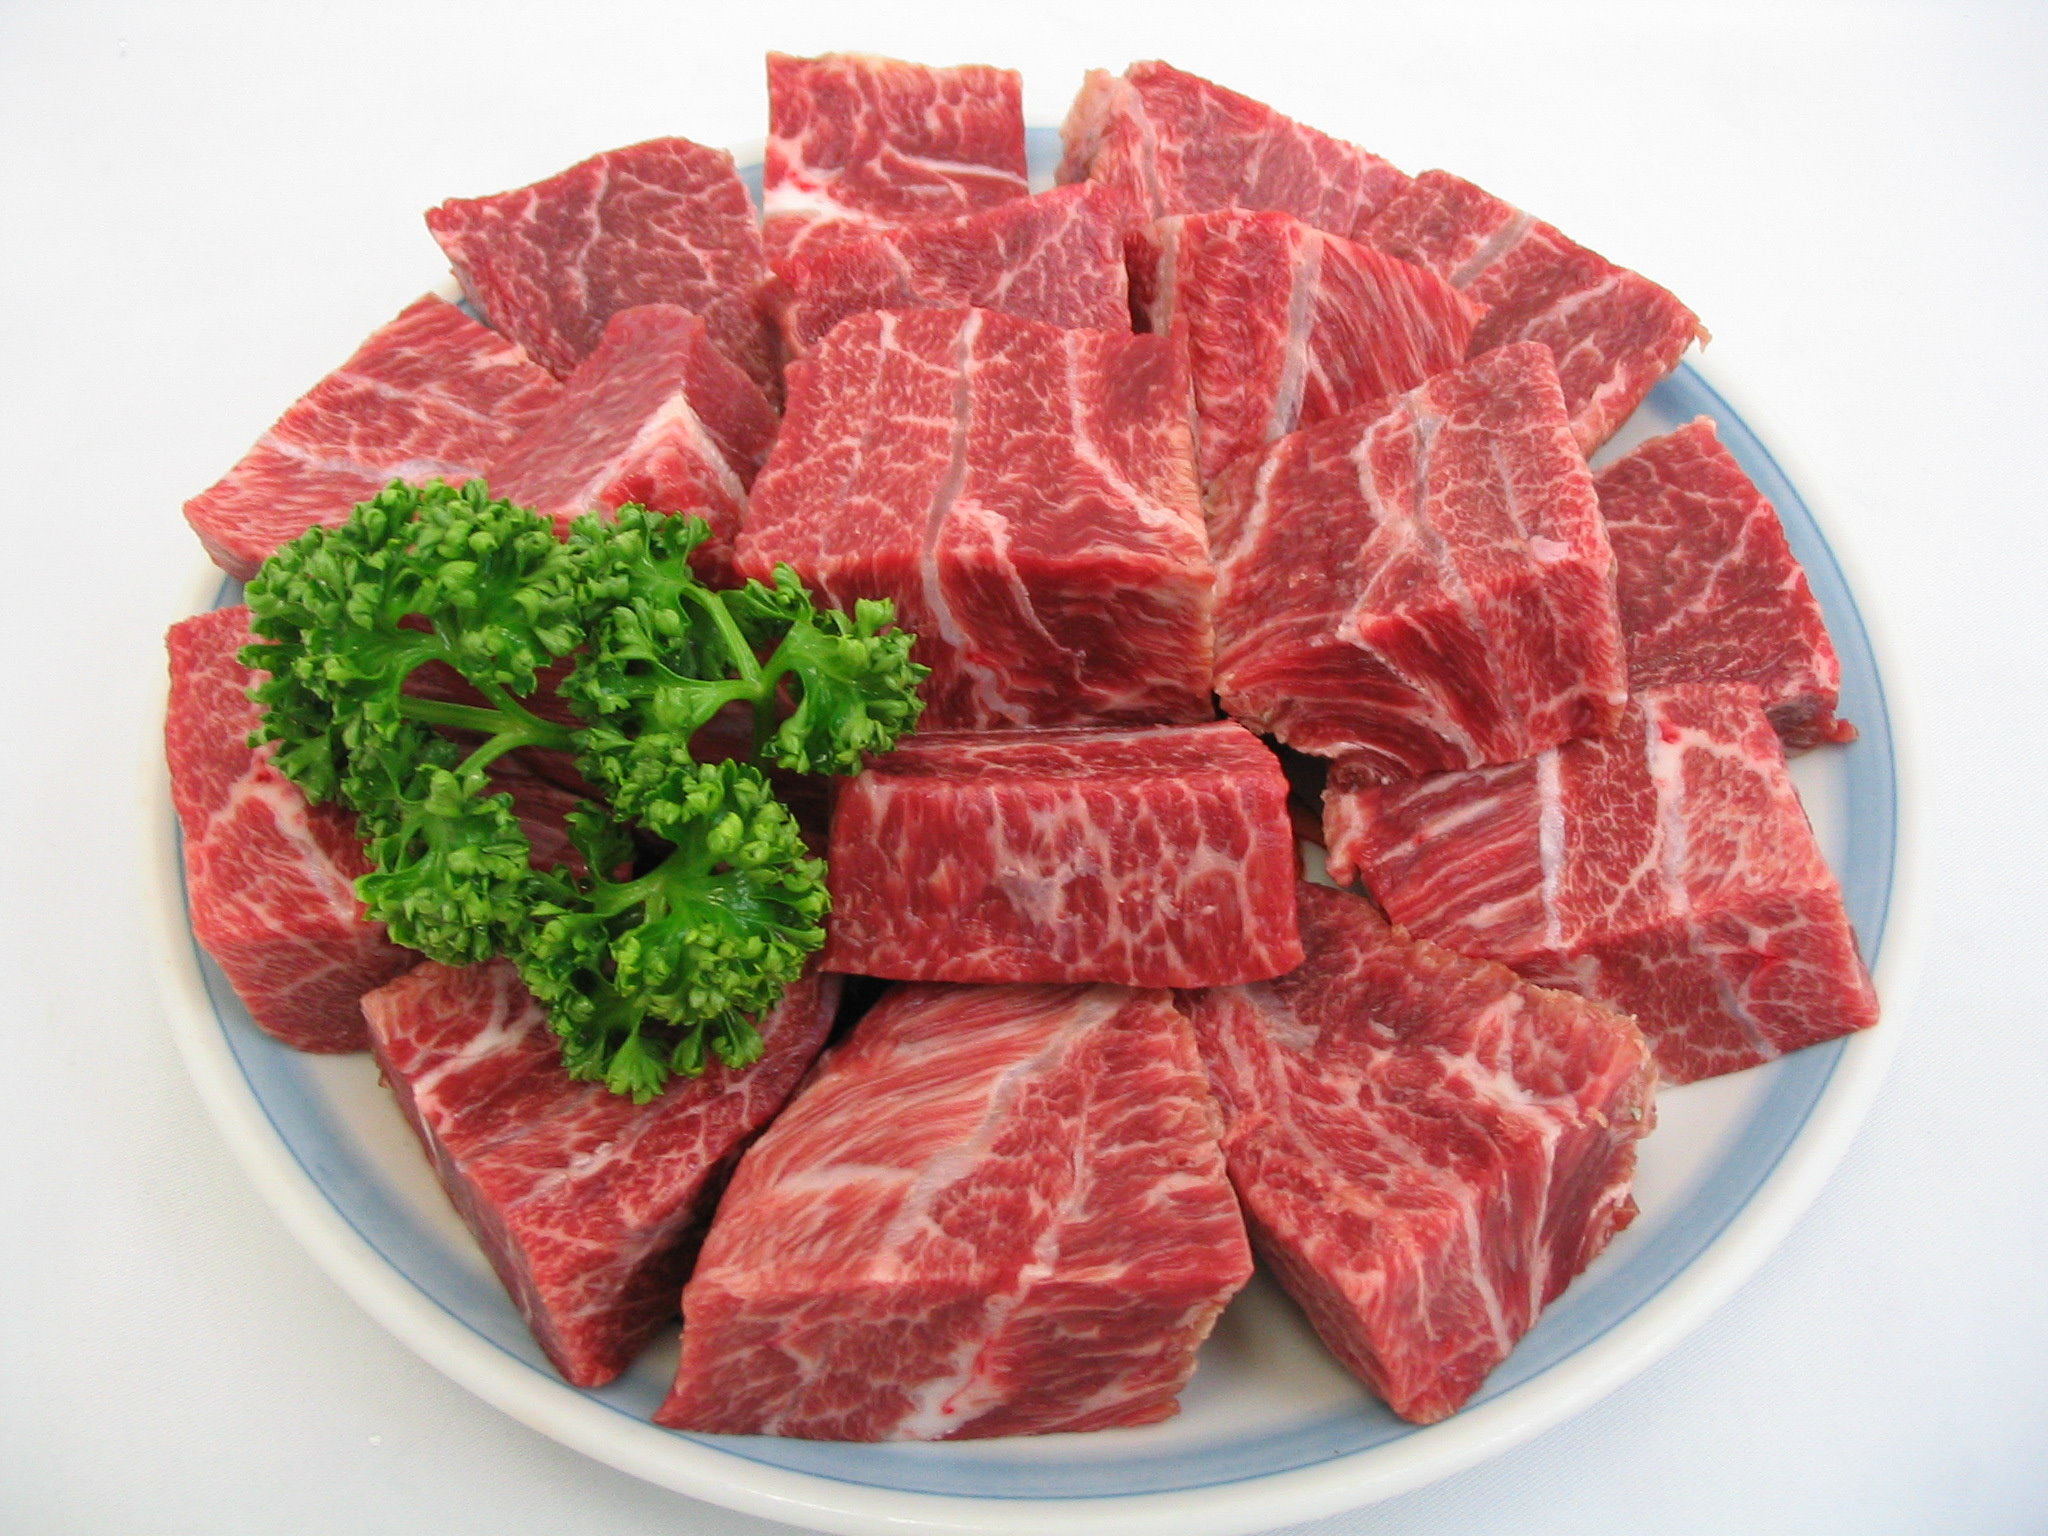 国産和牛 牛頬肉 煮込み用 600g